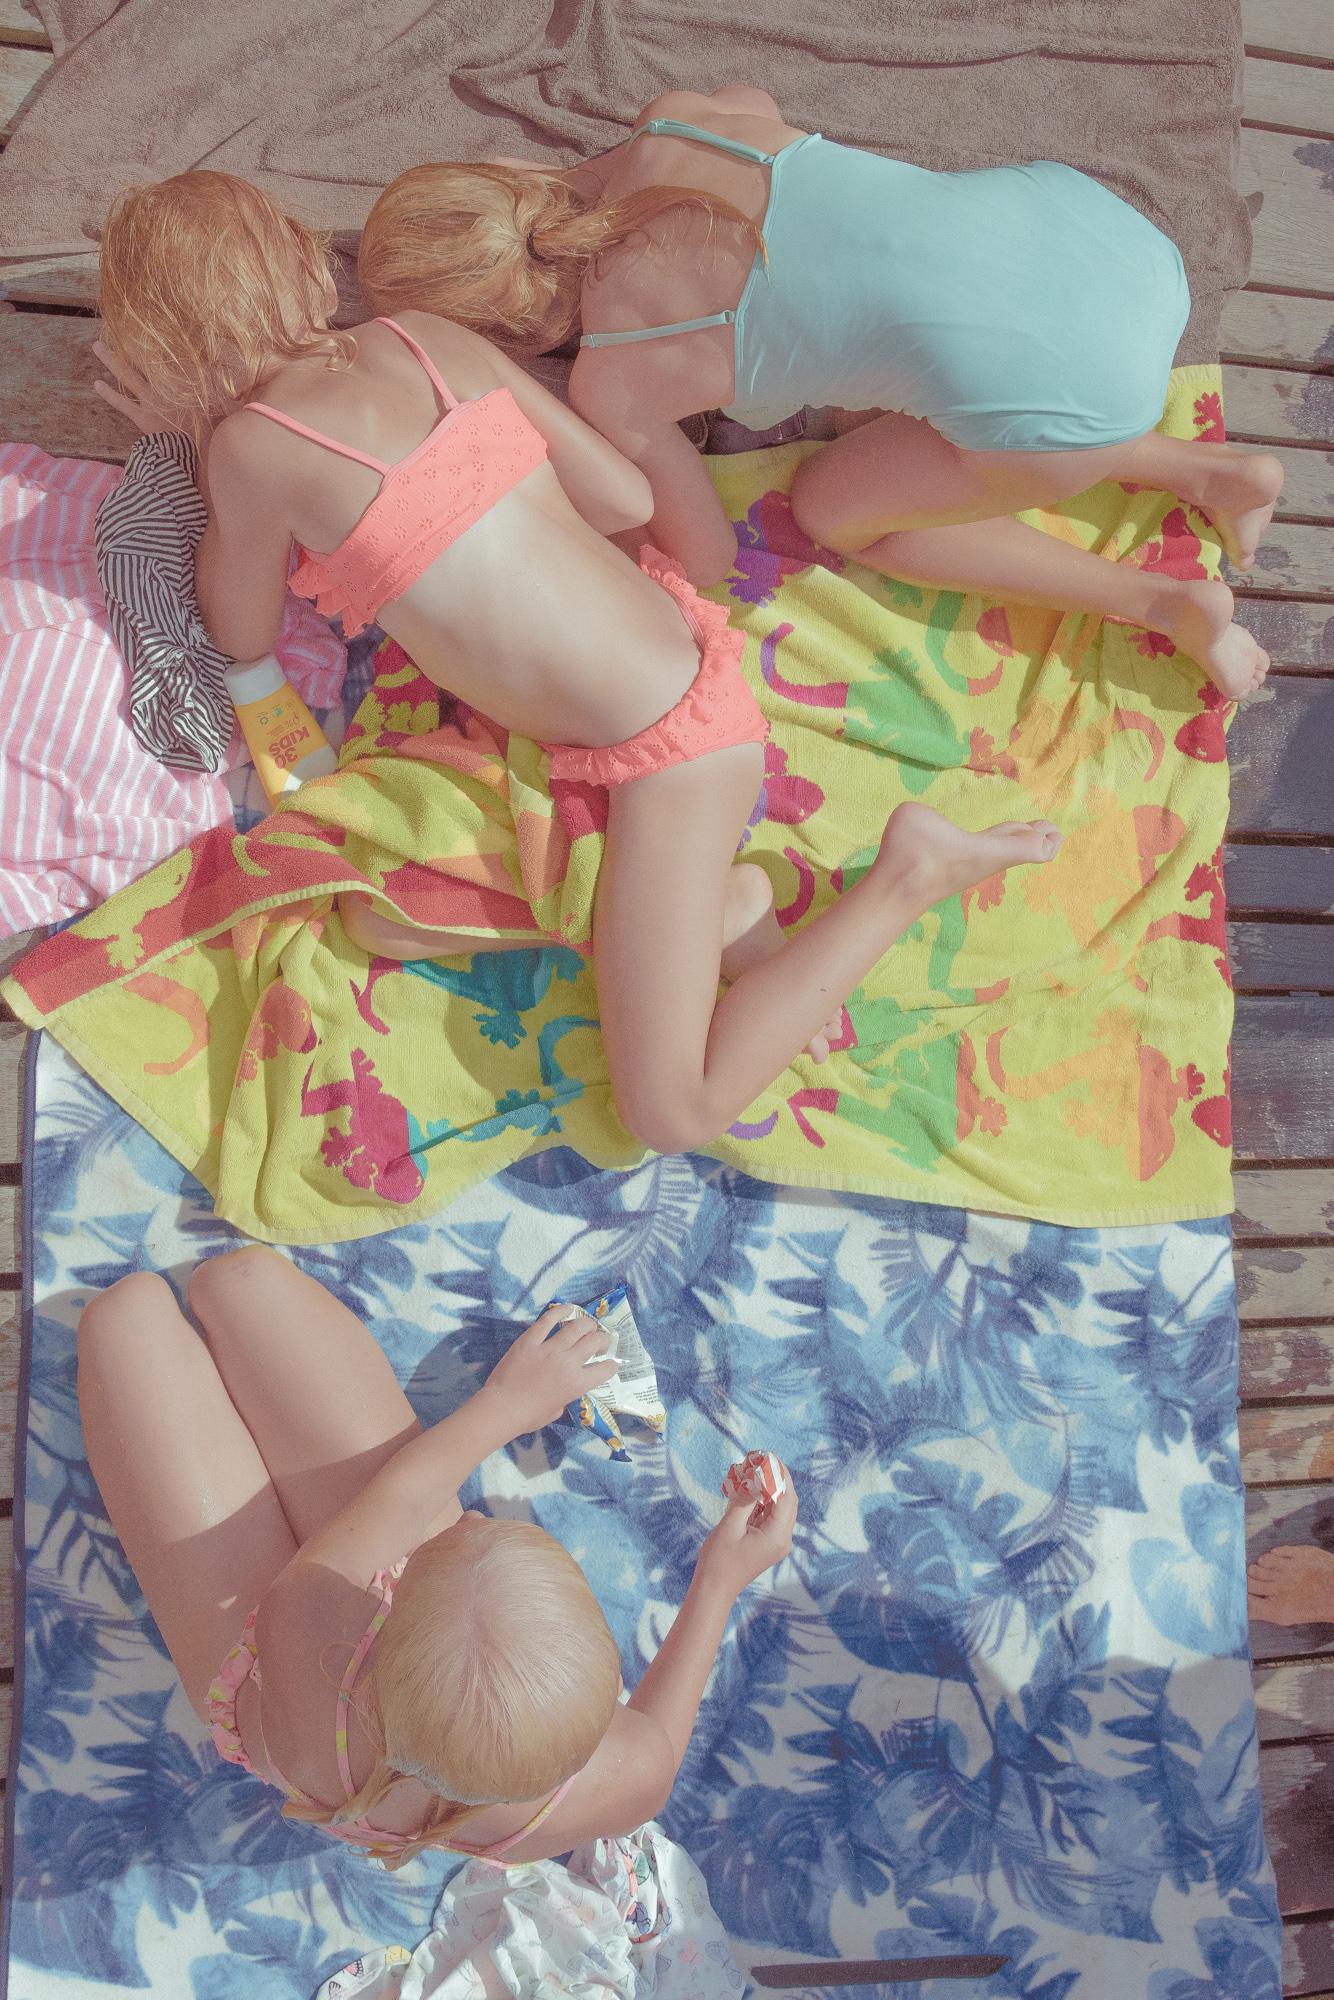 The Hottest Summer-1.jpg